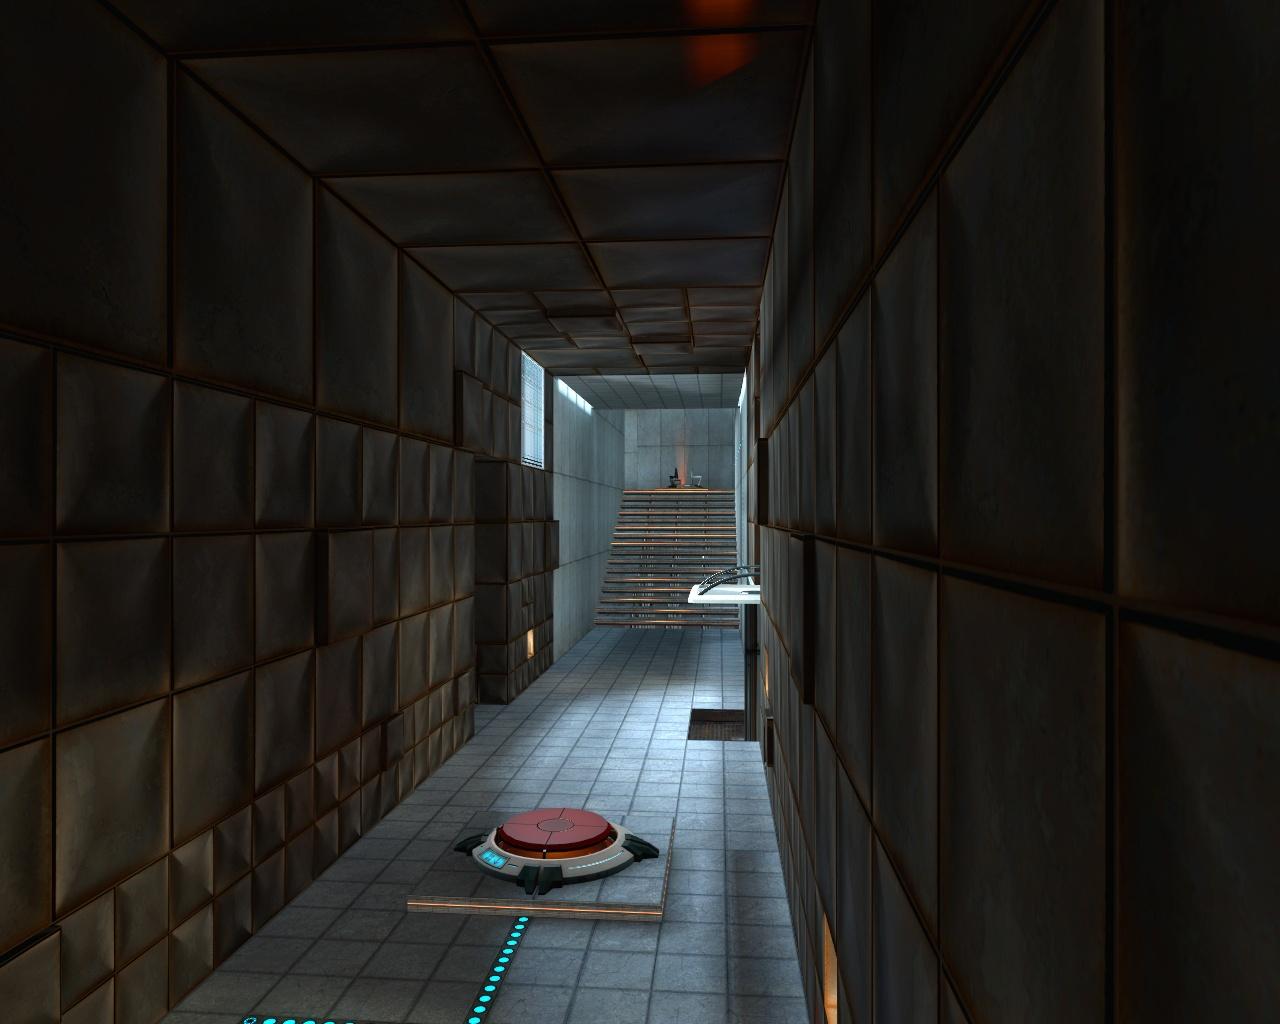 Portal-Test14.jpg